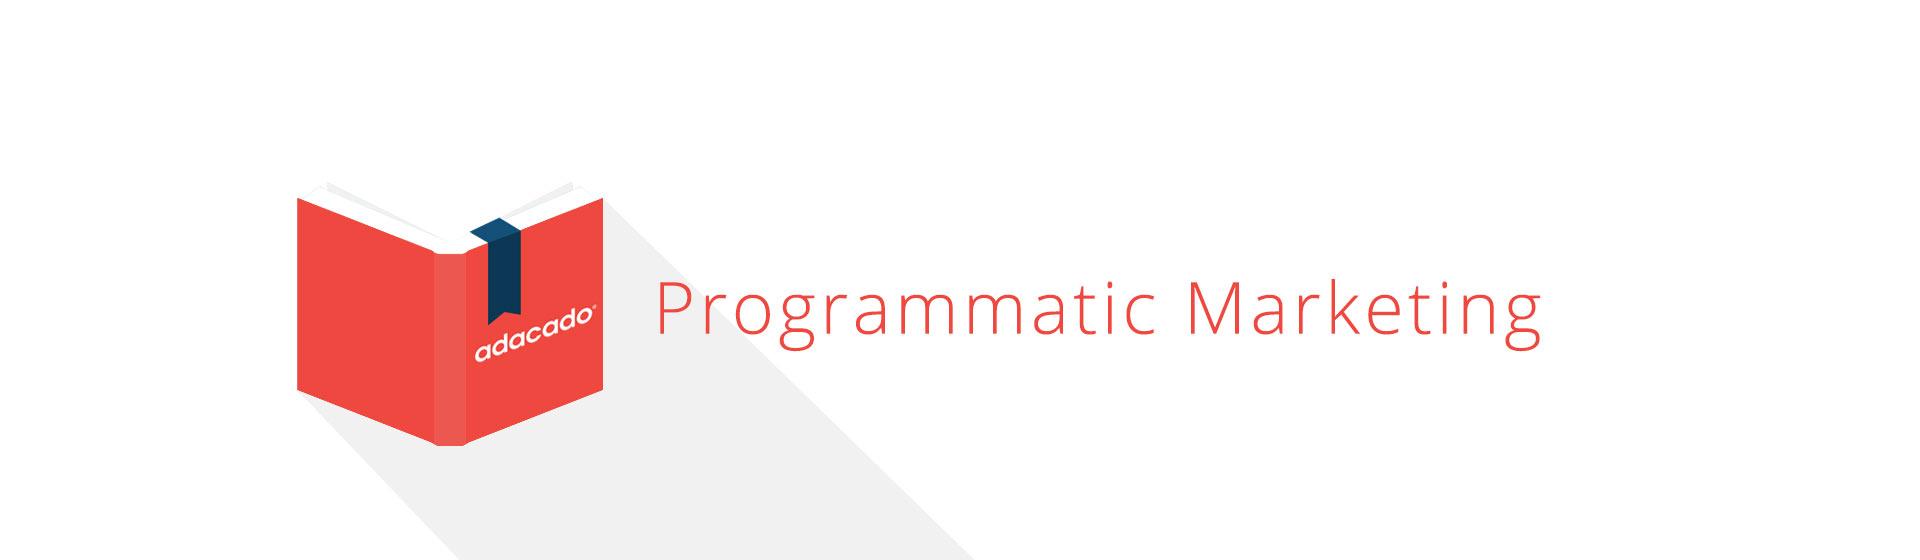 programmatic marketing